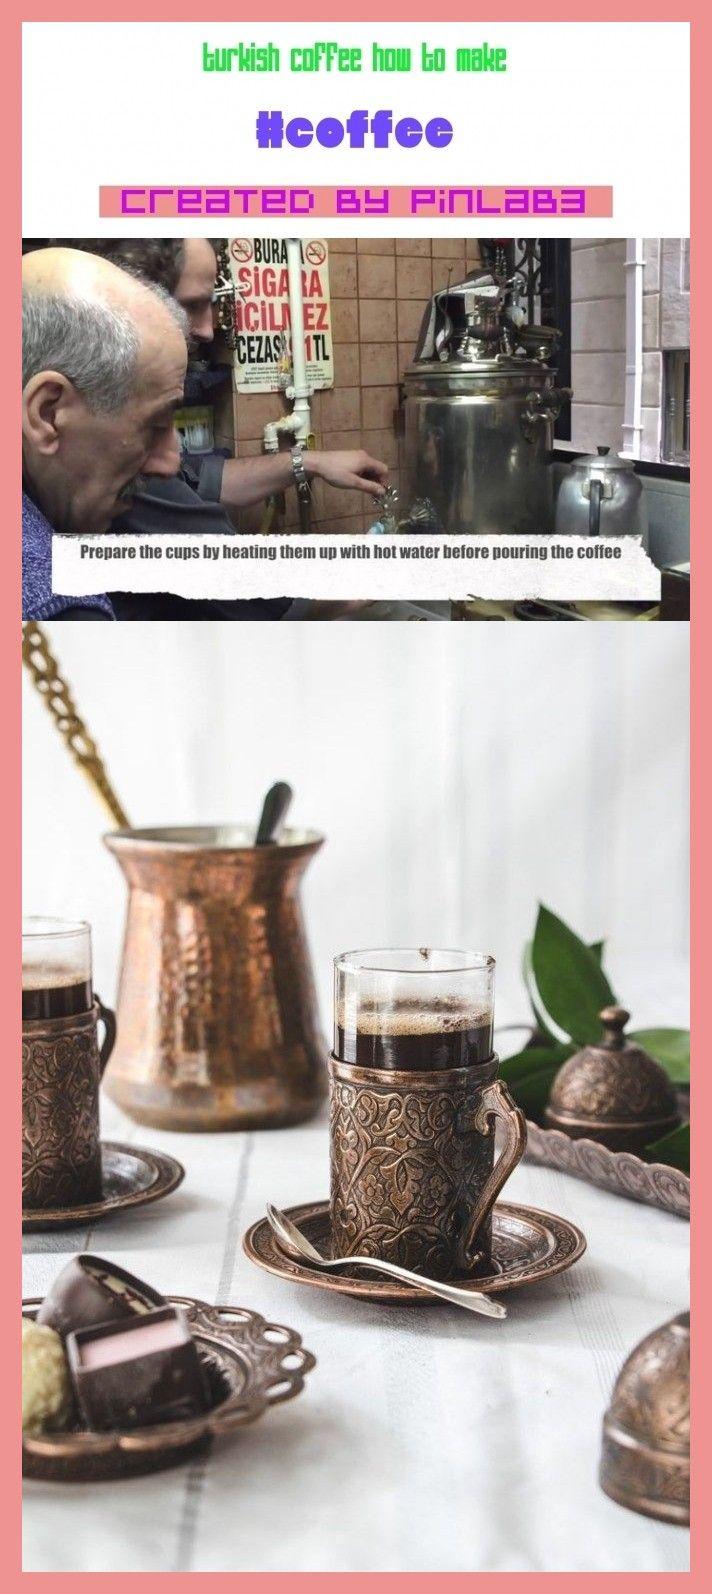 turkish coffee how to make in 2020 | Turkish coffee ...